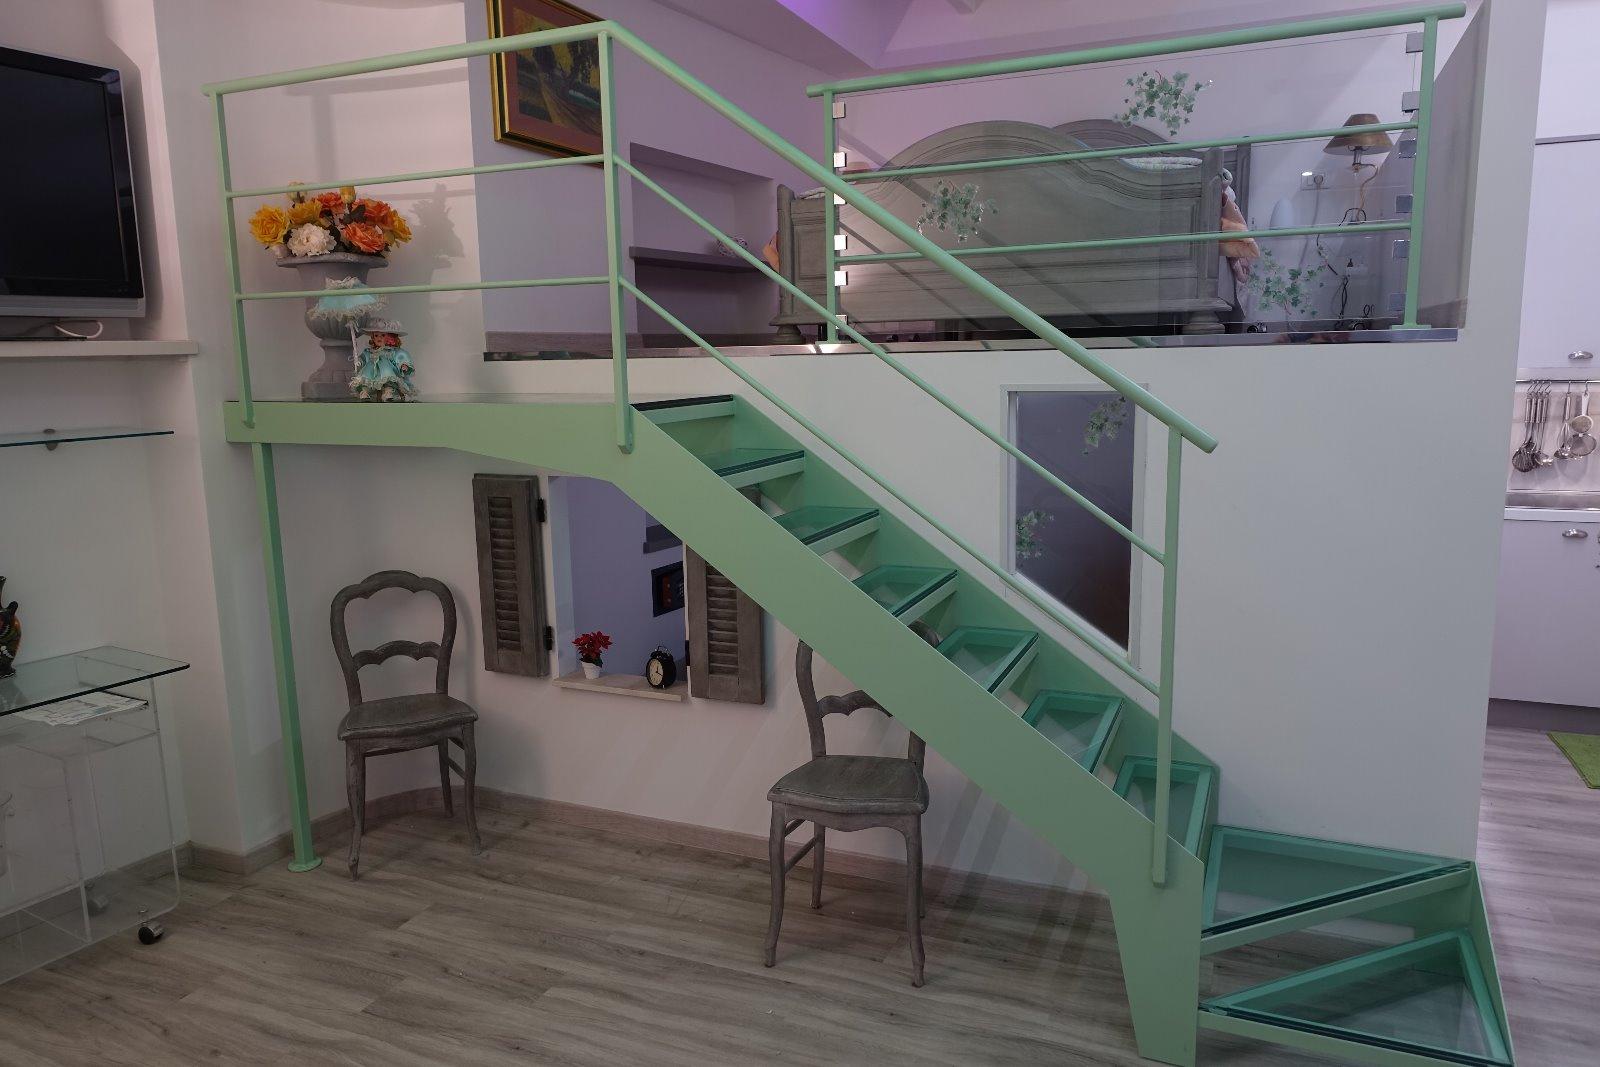 Offres locations vacances menton centre ville for Location appartement atypique